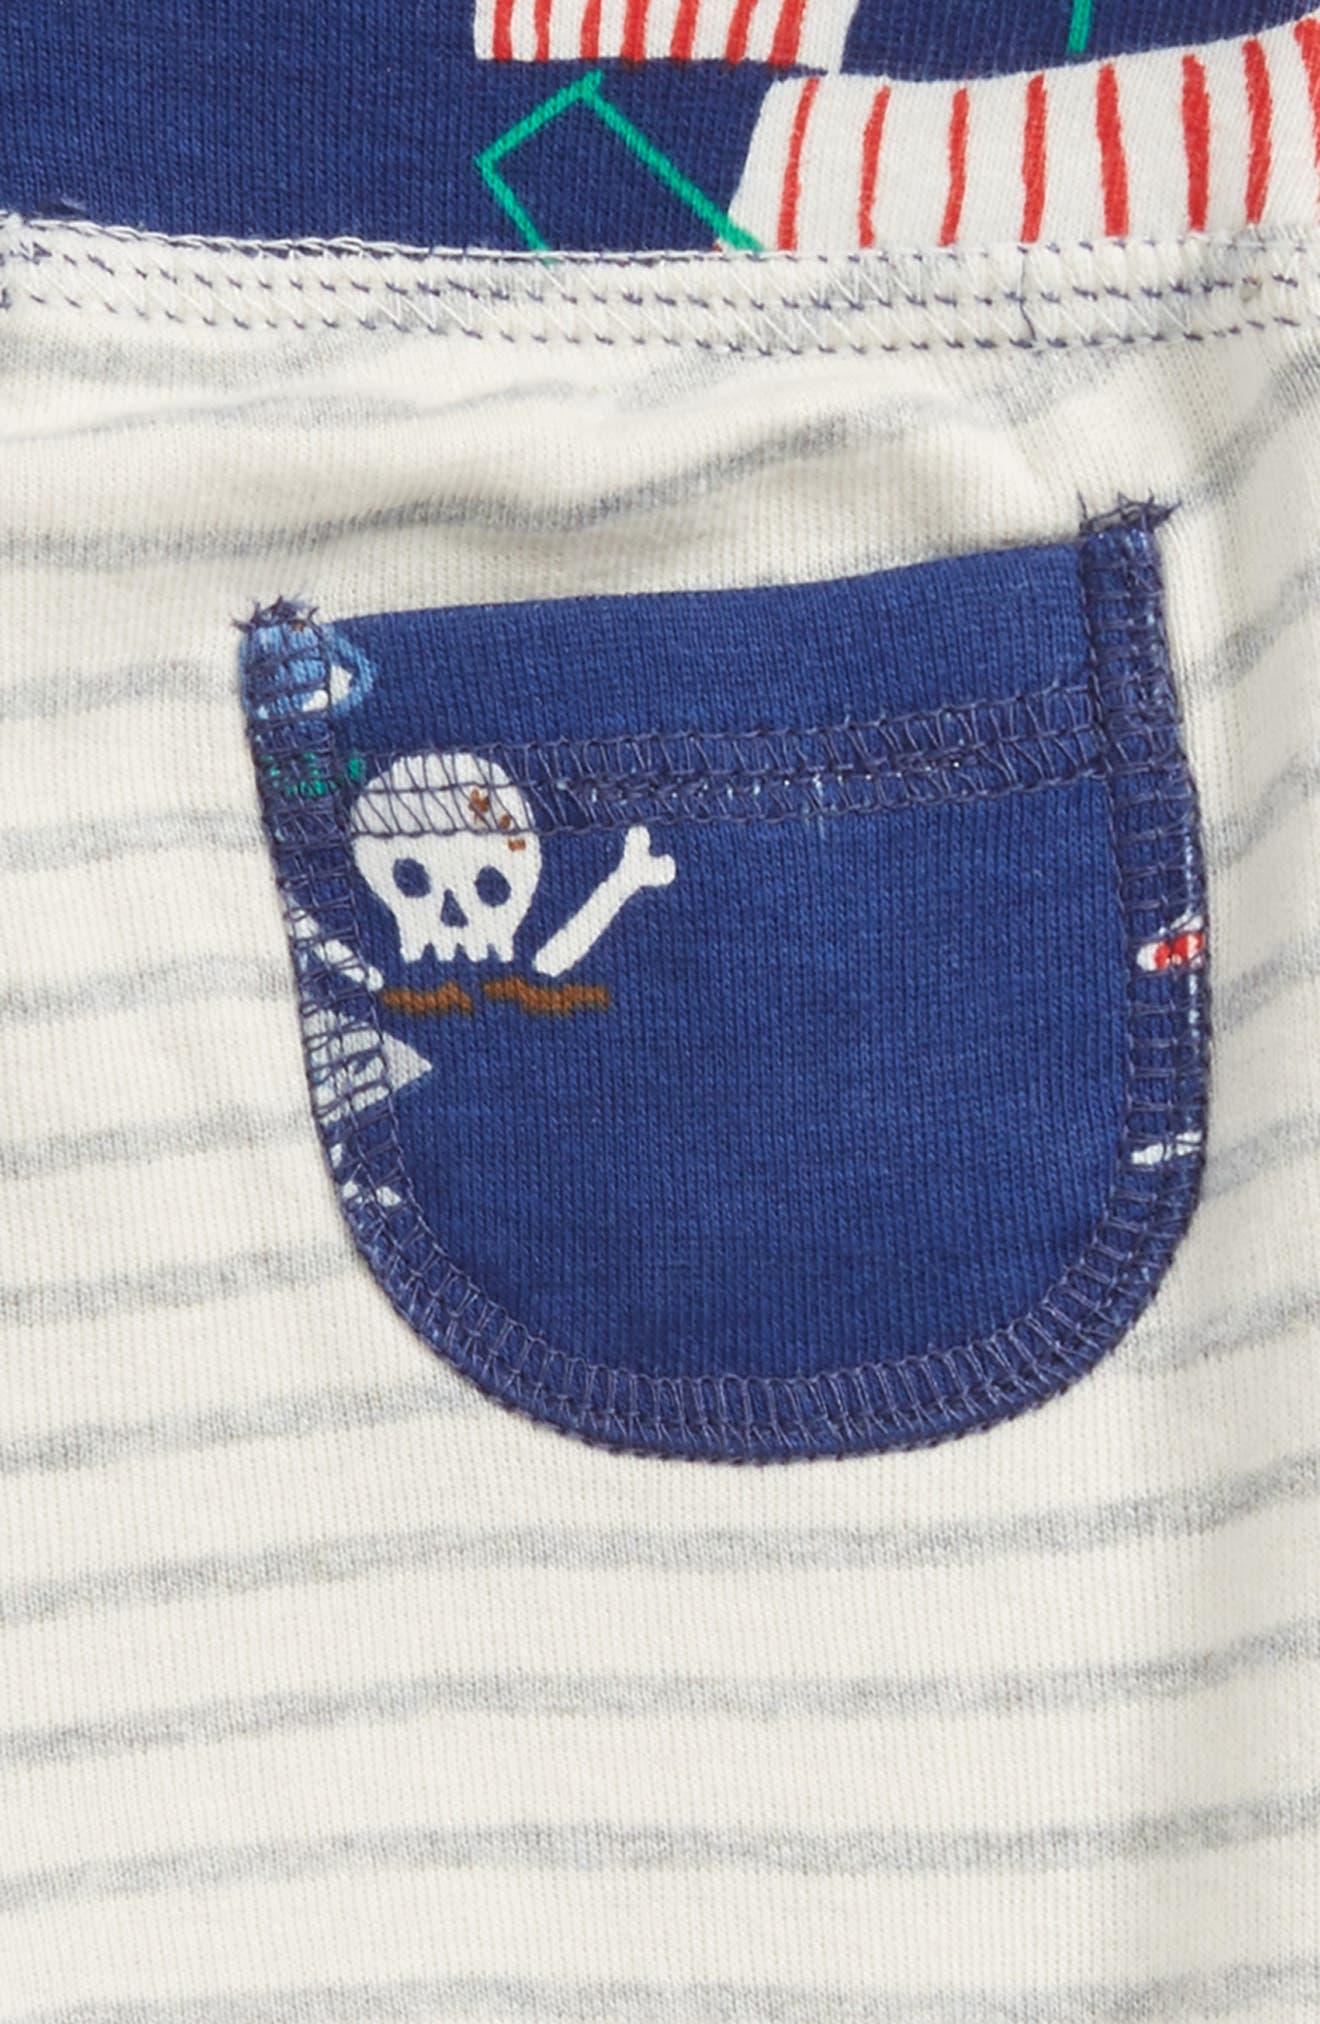 Reversible Knee Patch Pants,                             Alternate thumbnail 4, color,                             404